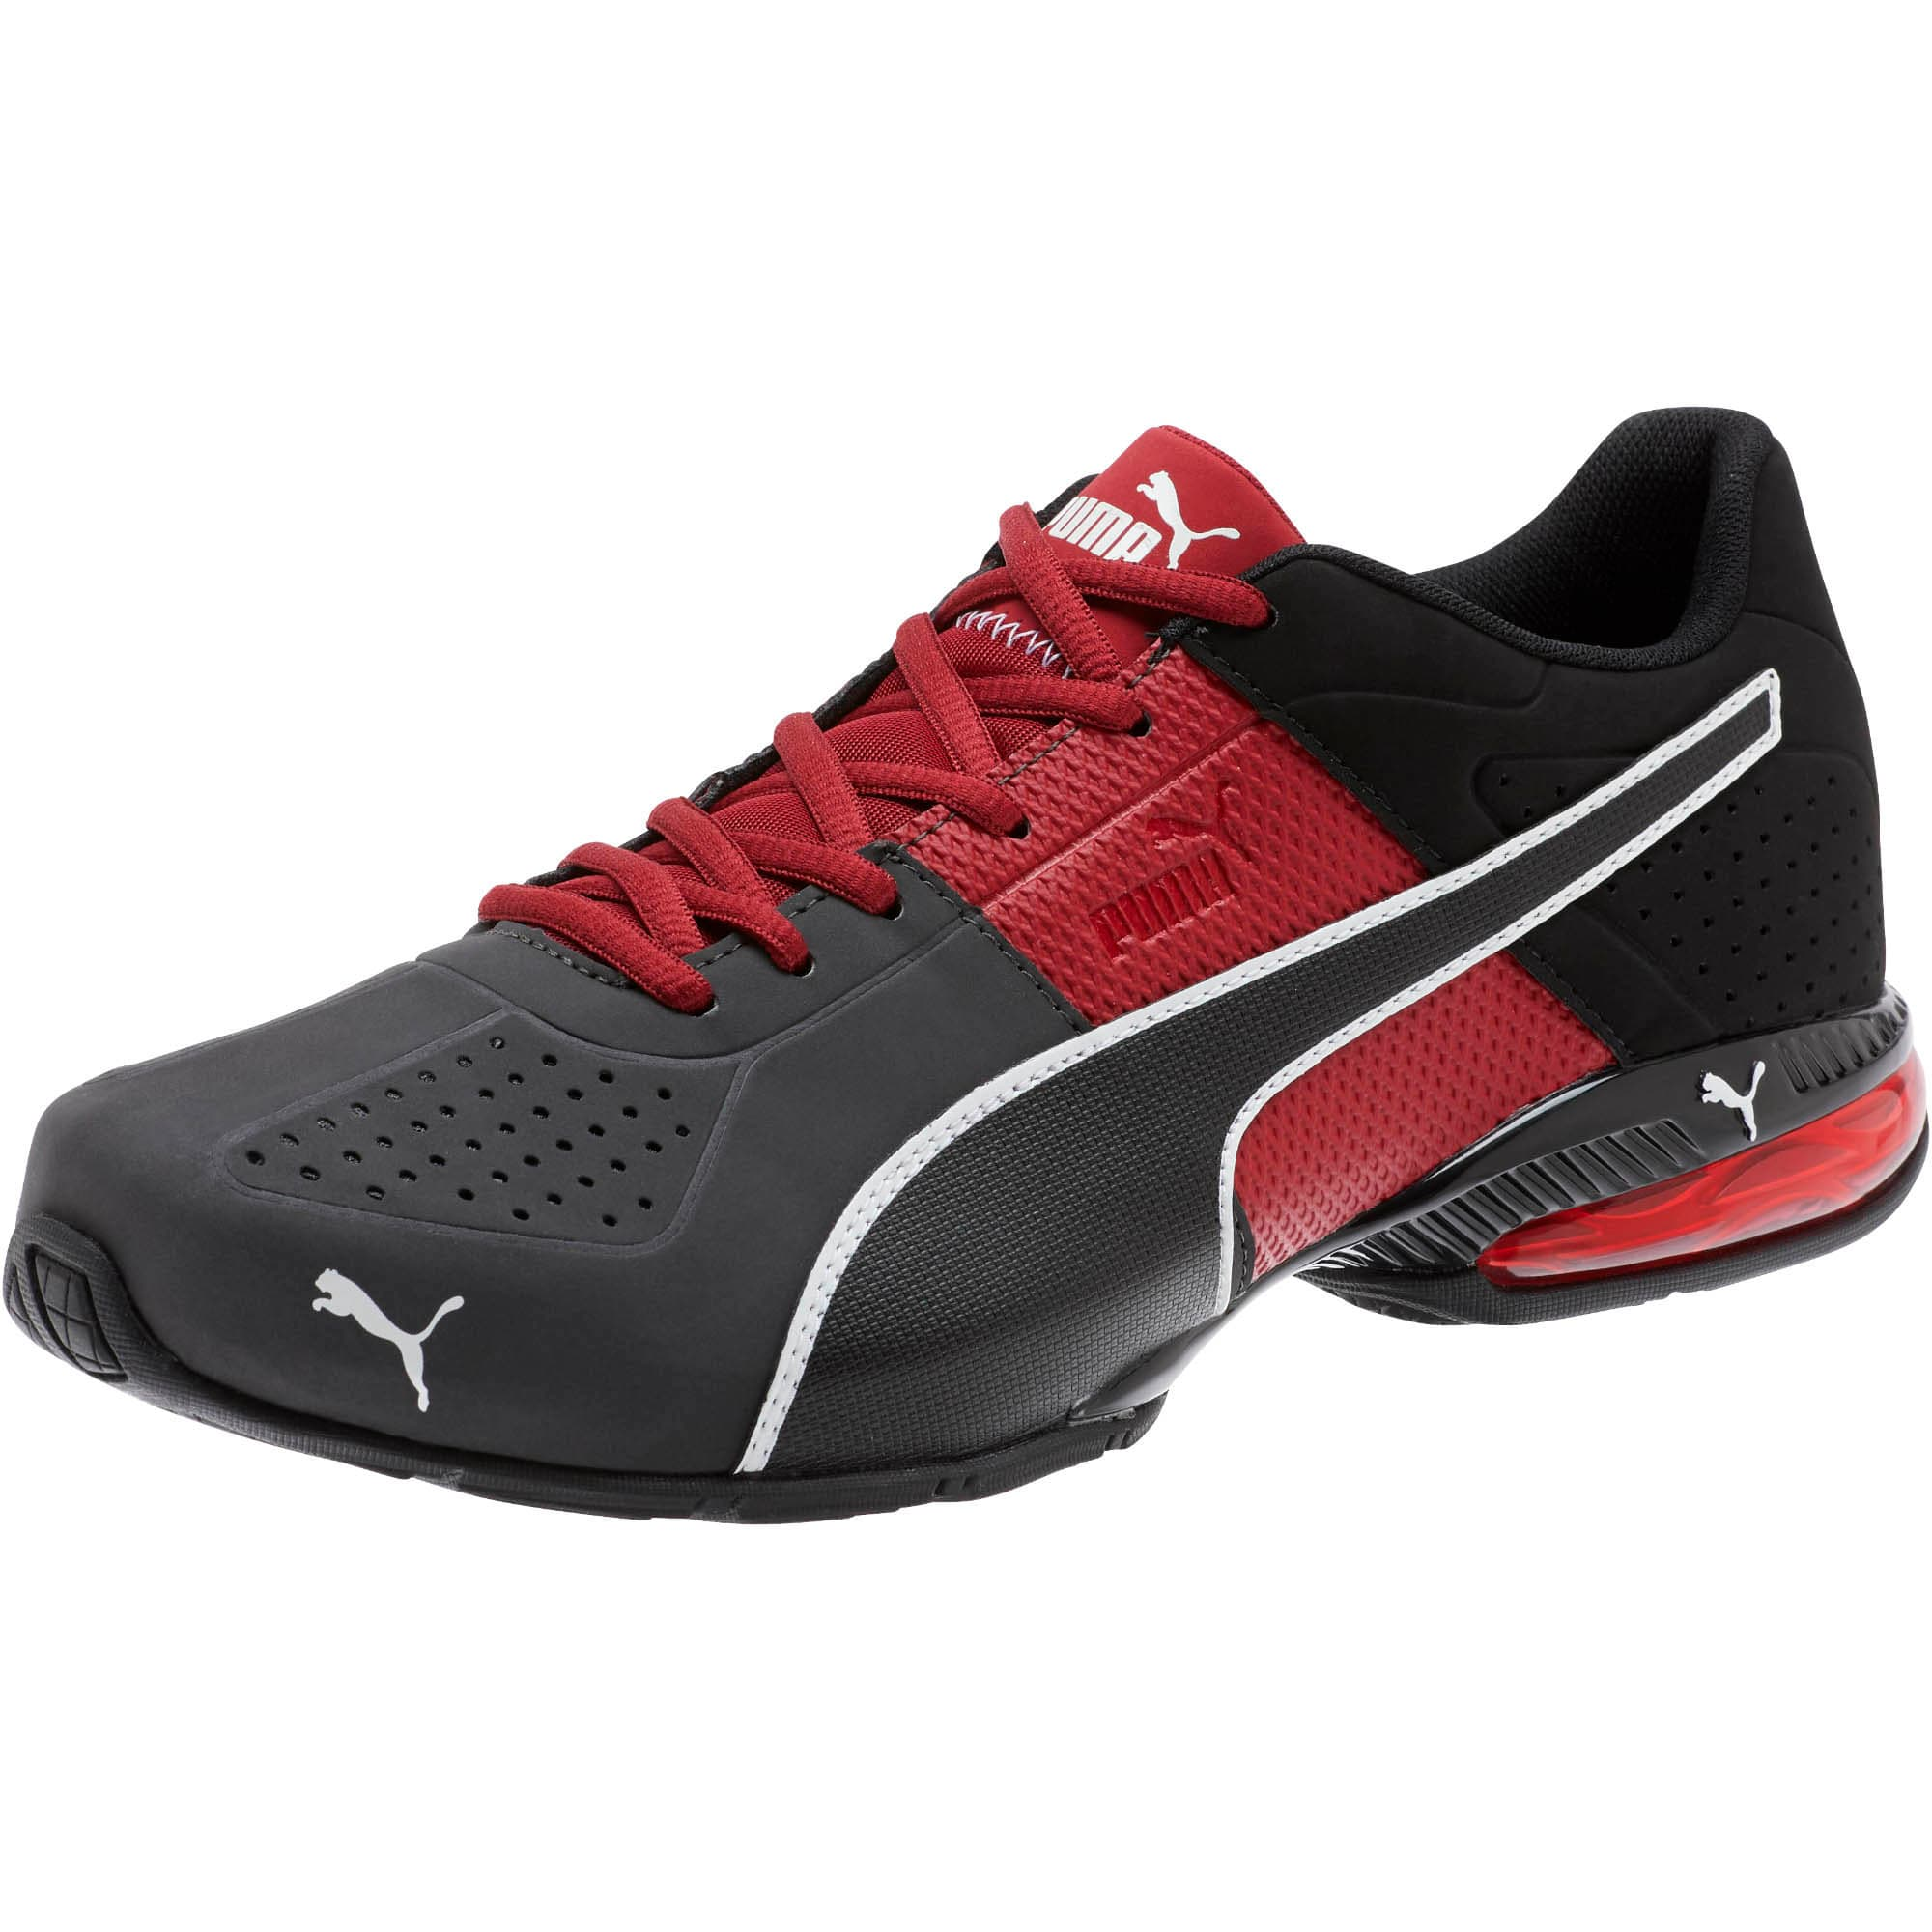 Thumbnail 1 of CELL Surin 2 Matte Men's Training Shoes, Rhubarb-Puma White, medium